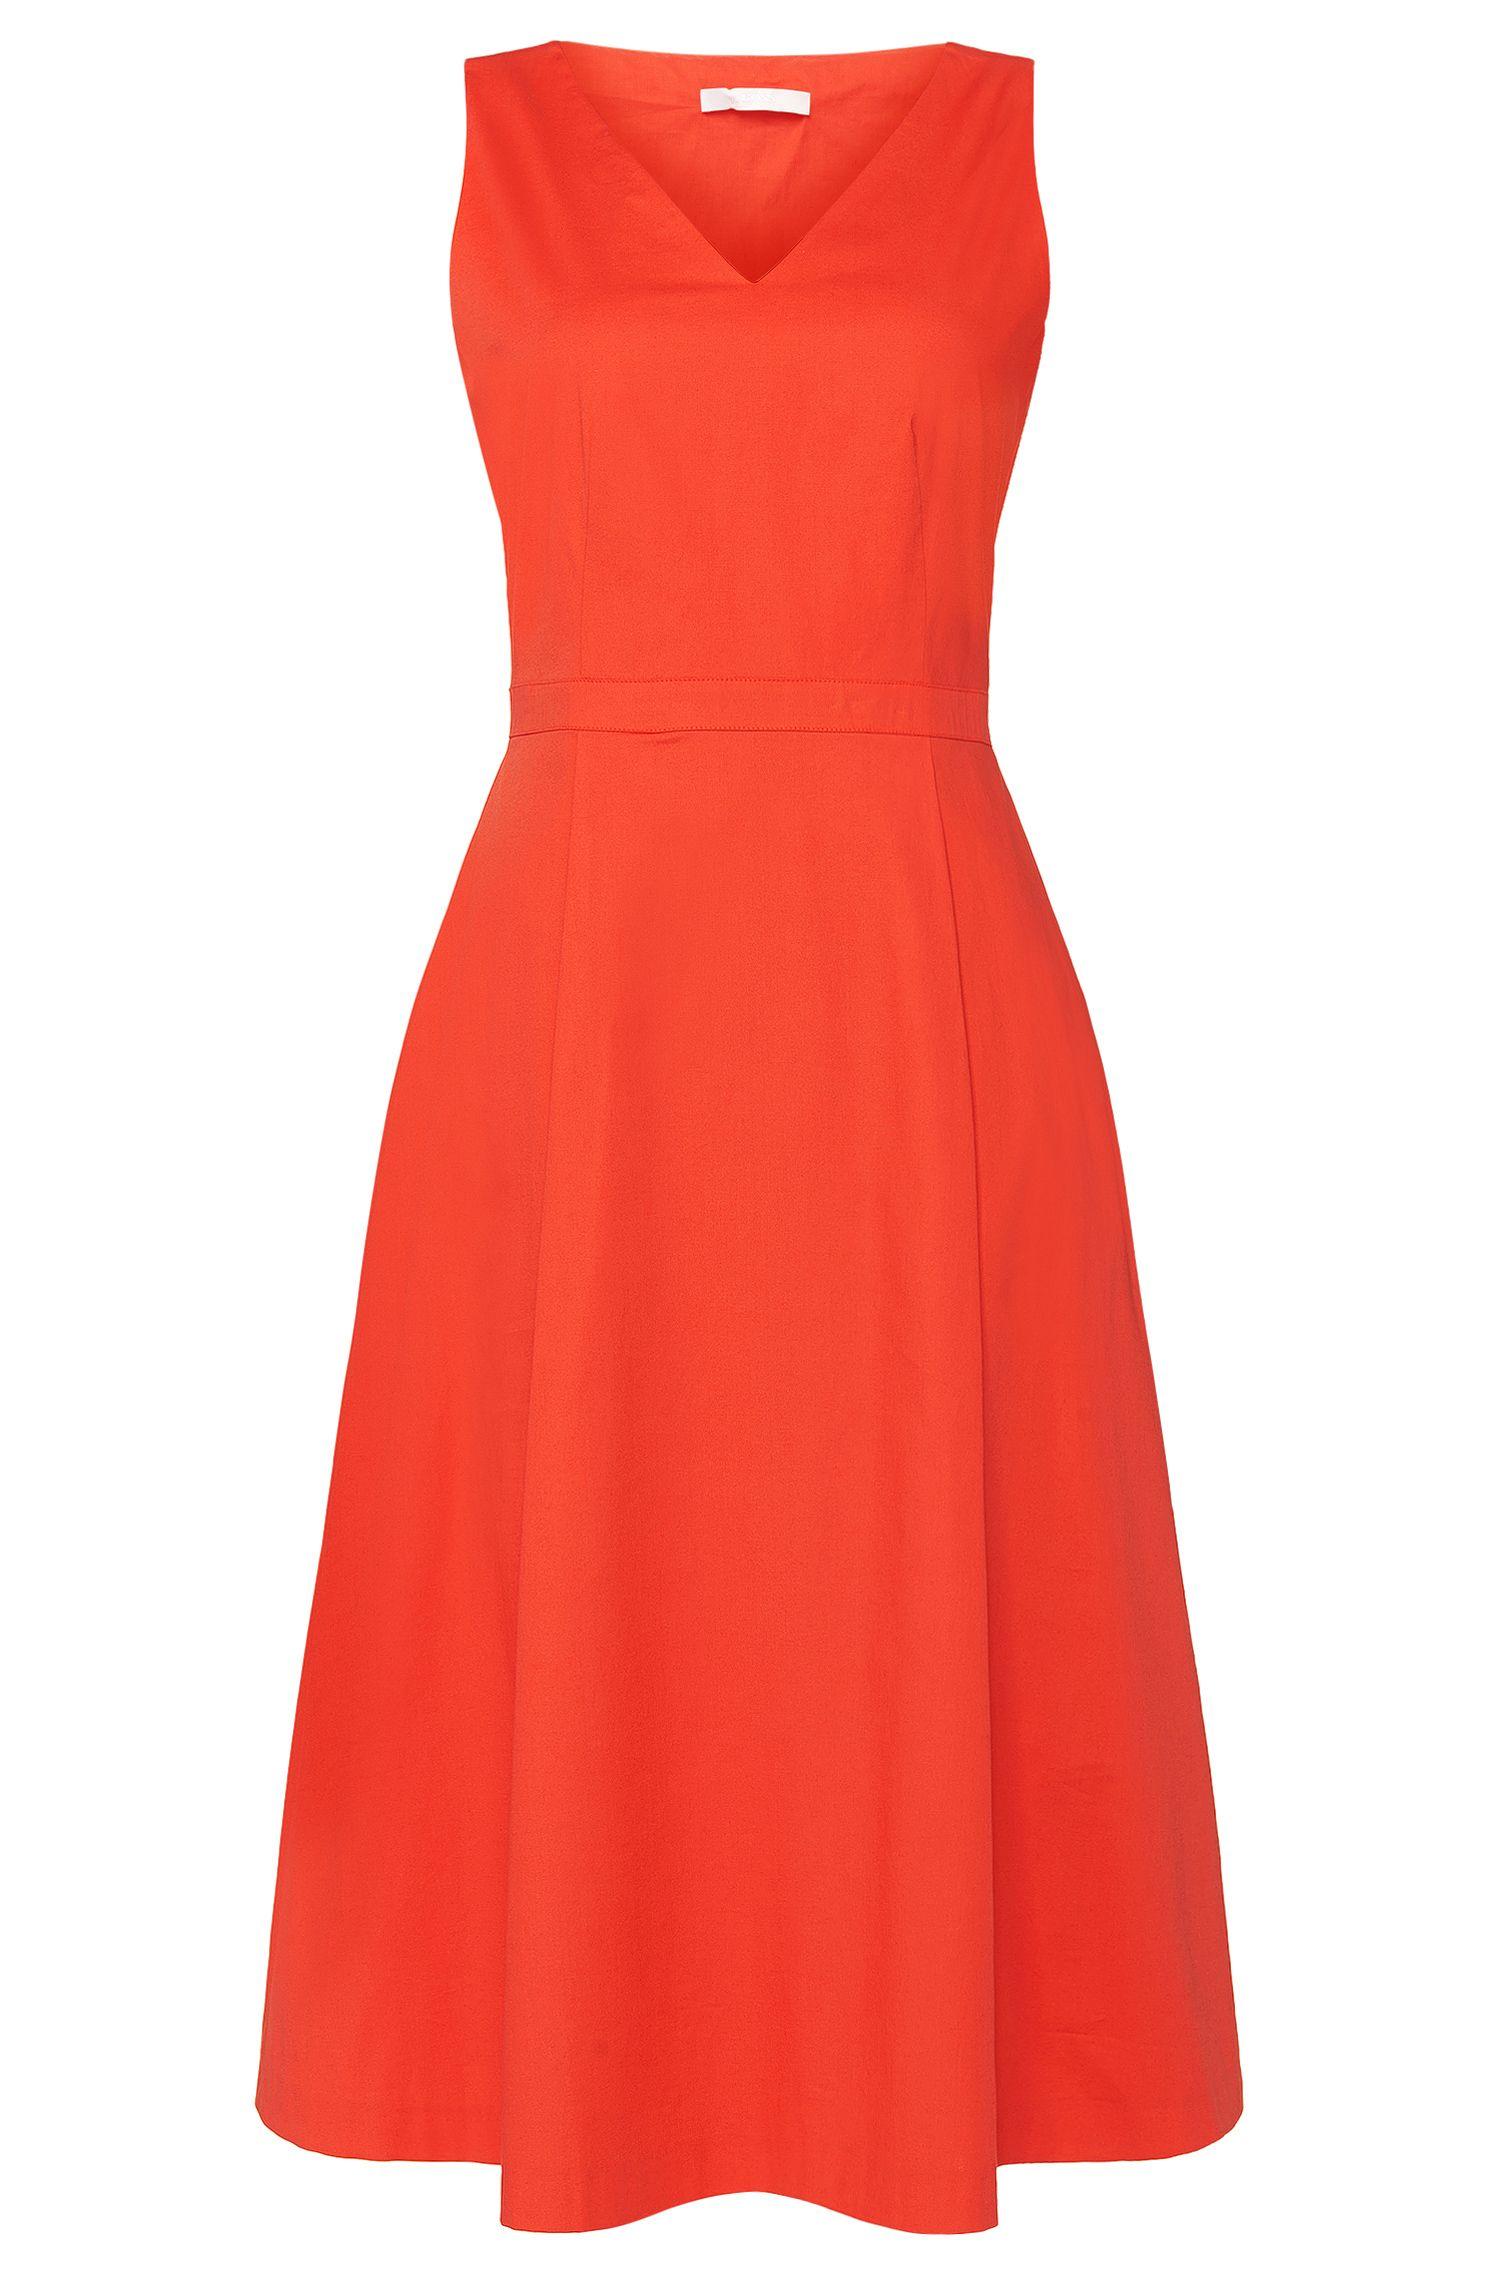 'Danana' | Stretch Cotton Cut Out Dress